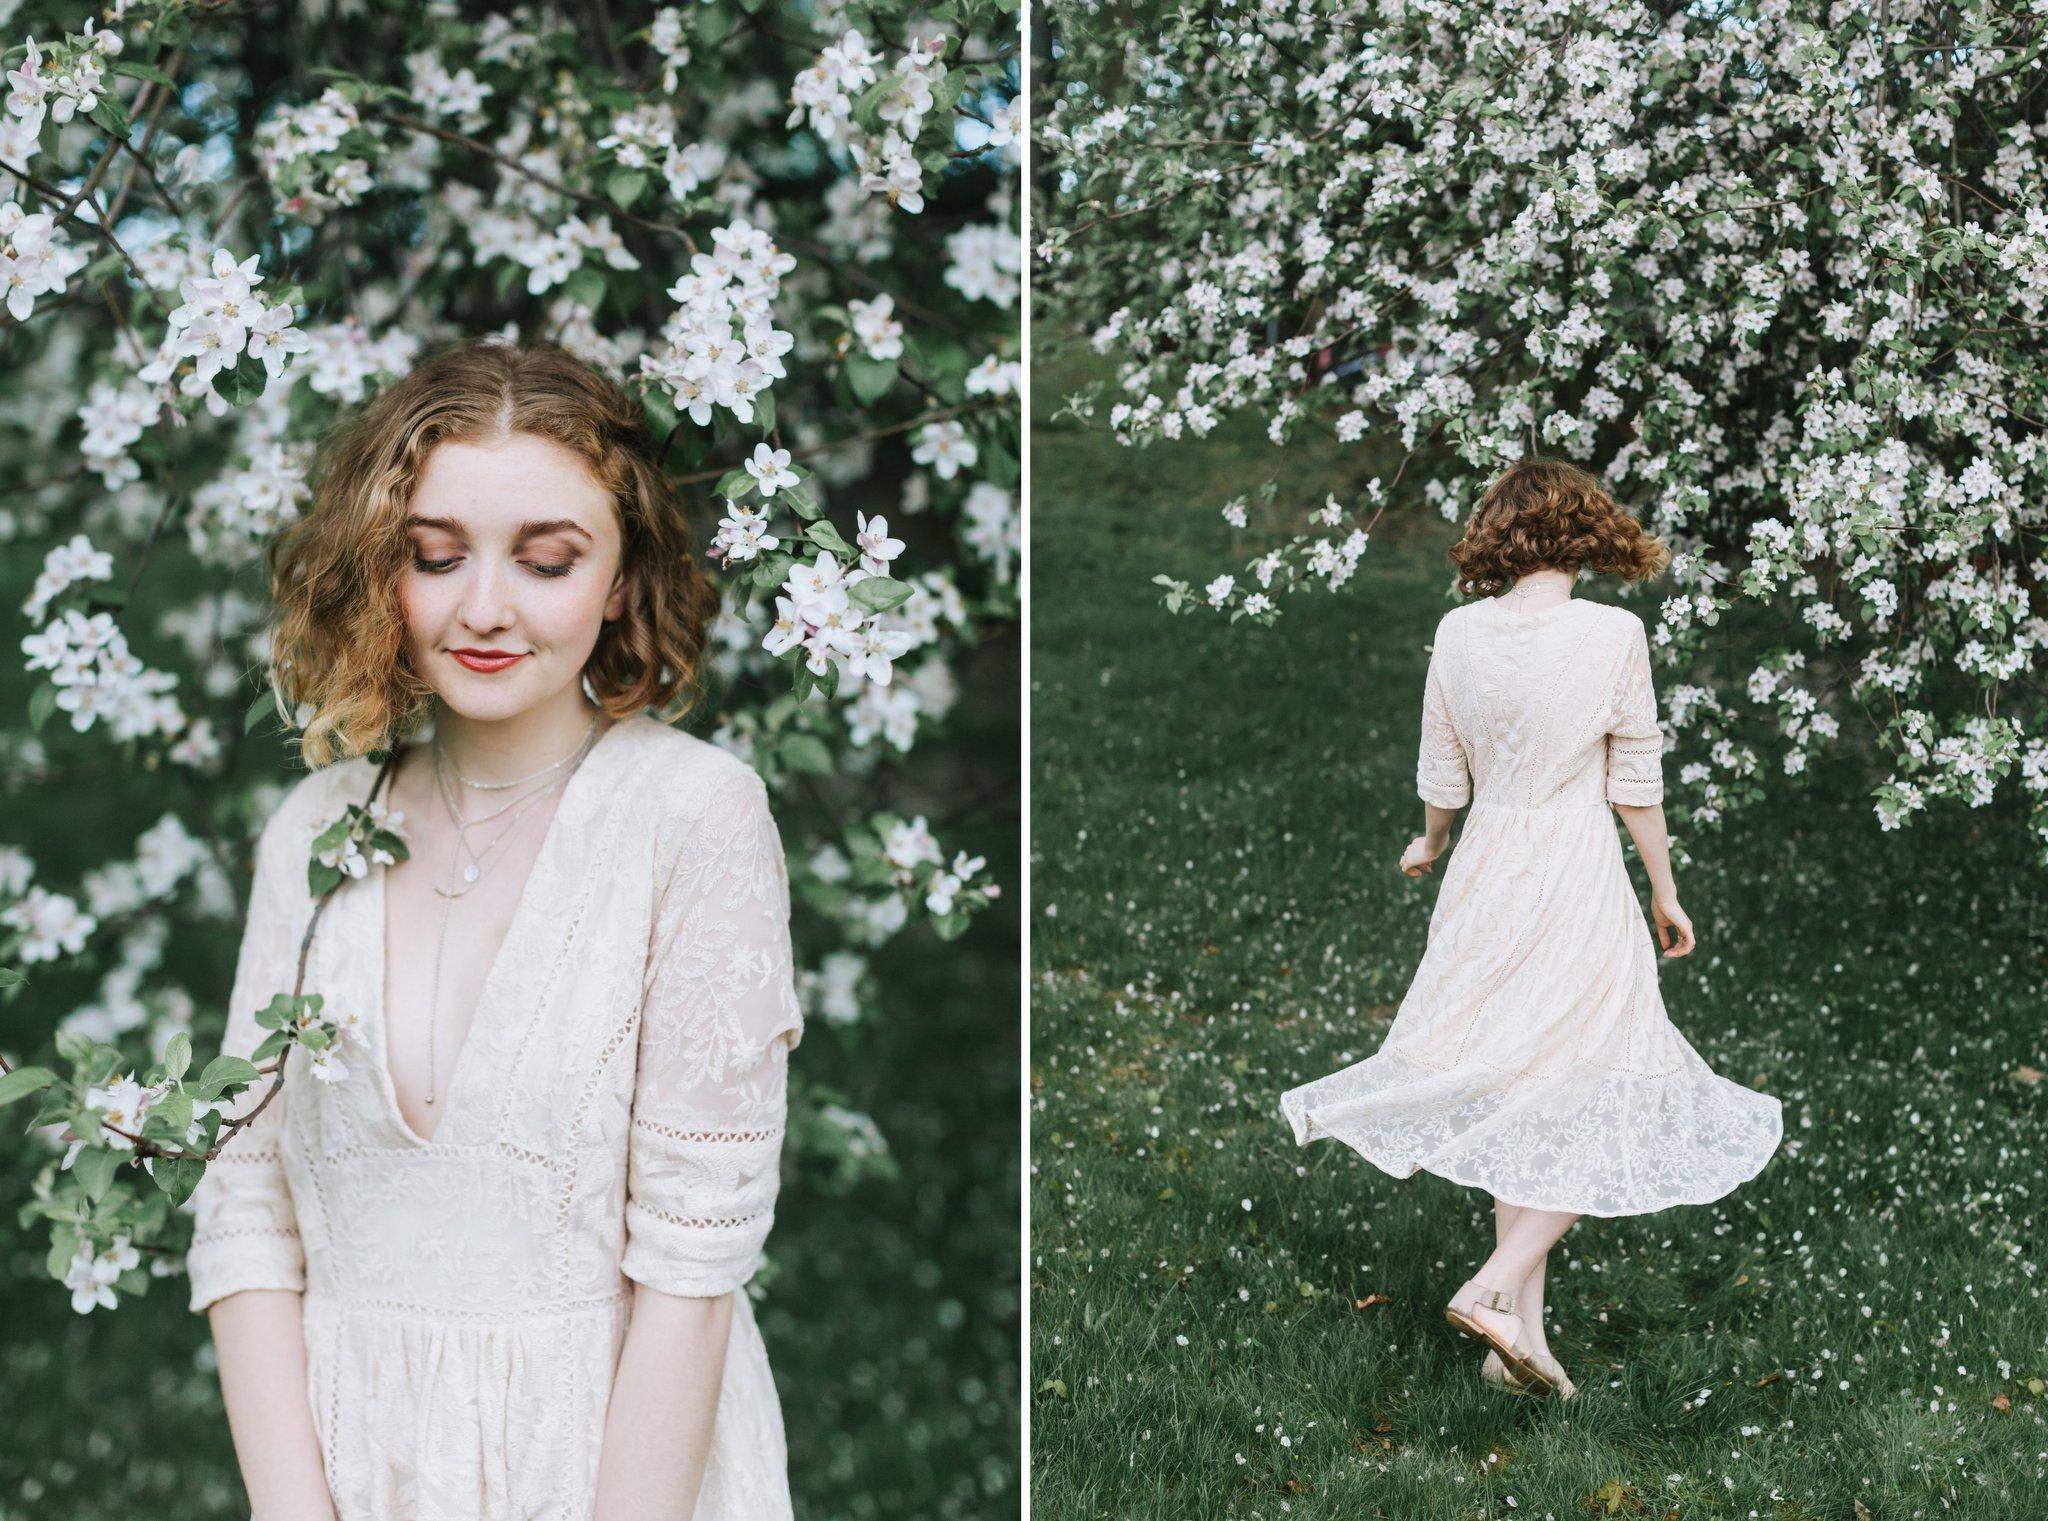 Spring_Fashion_Cherry_Blossom_NYC_1.jpg